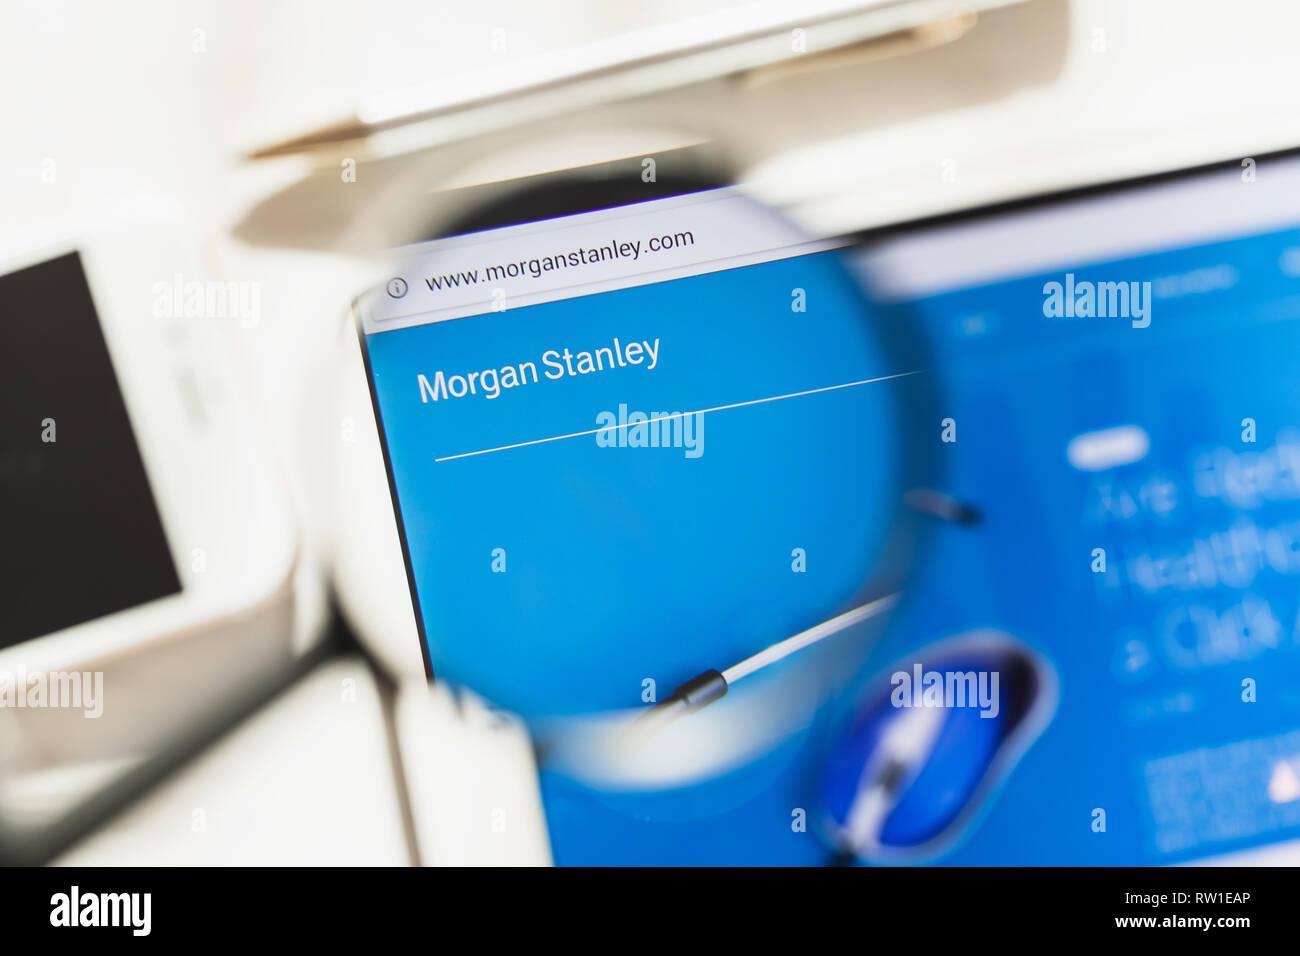 Morgan Stanley Online Stock Photos & Morgan Stanley Online